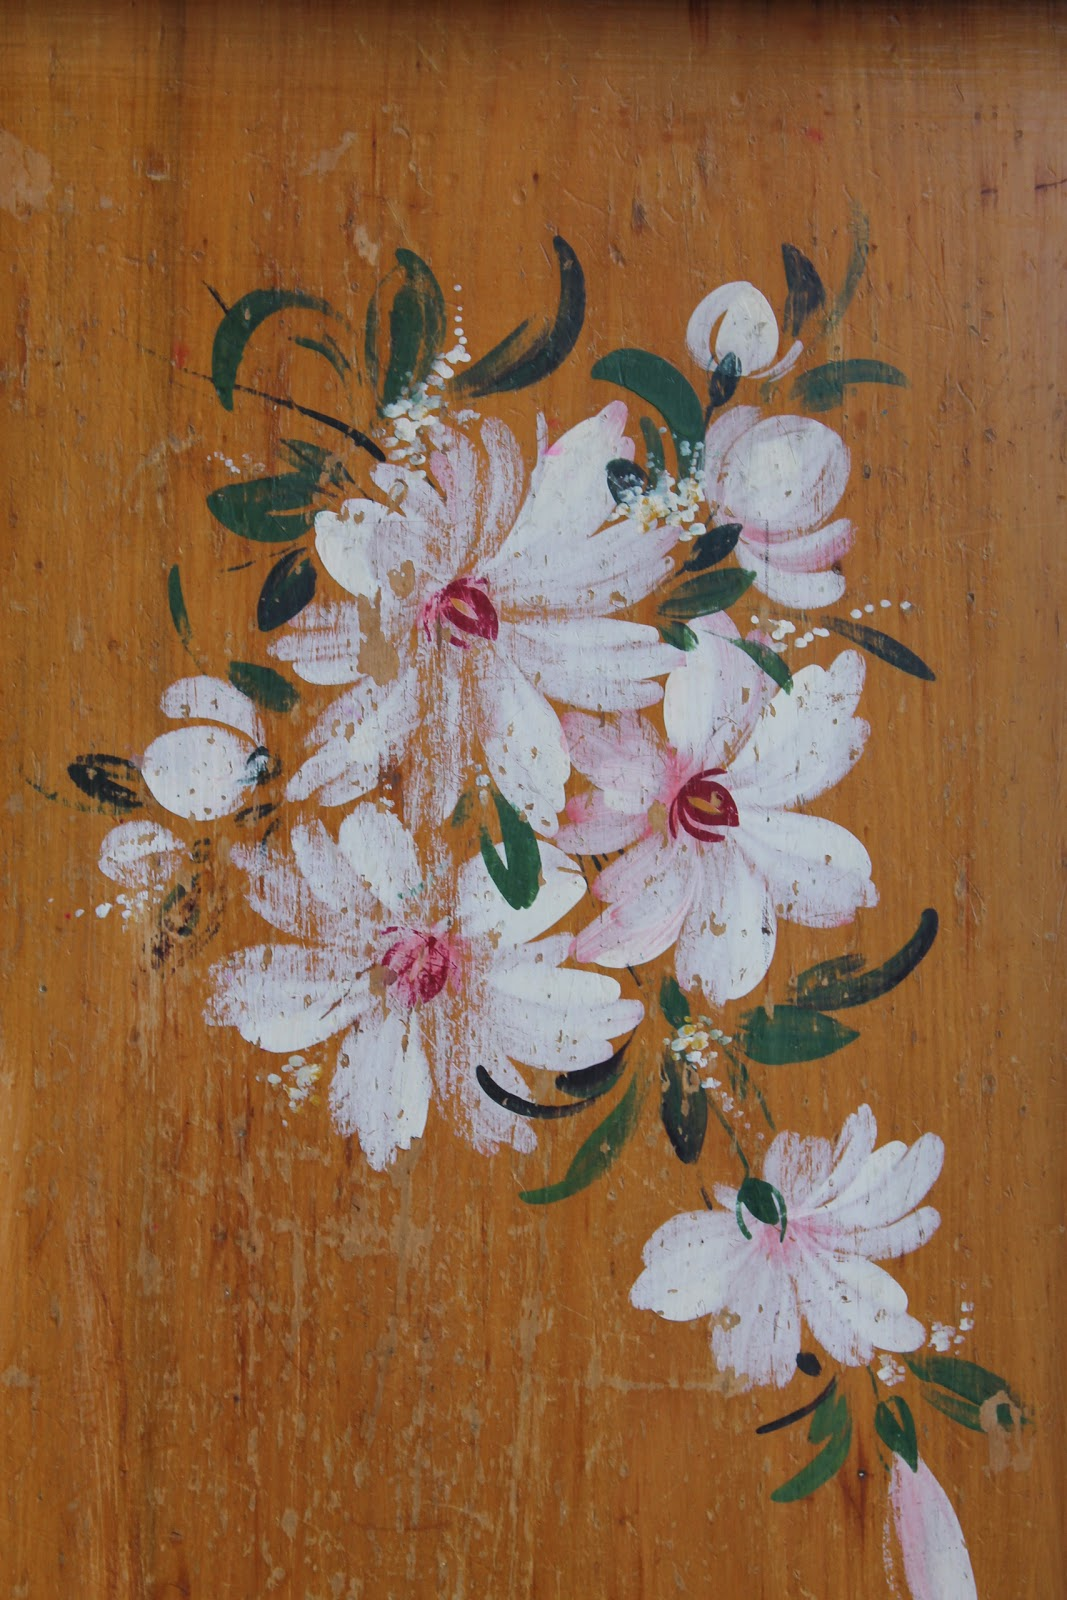 Fotos De Flores Pintadas A Mano - Flores Pintadas A Mano Hogar, Muebles Y Jardín